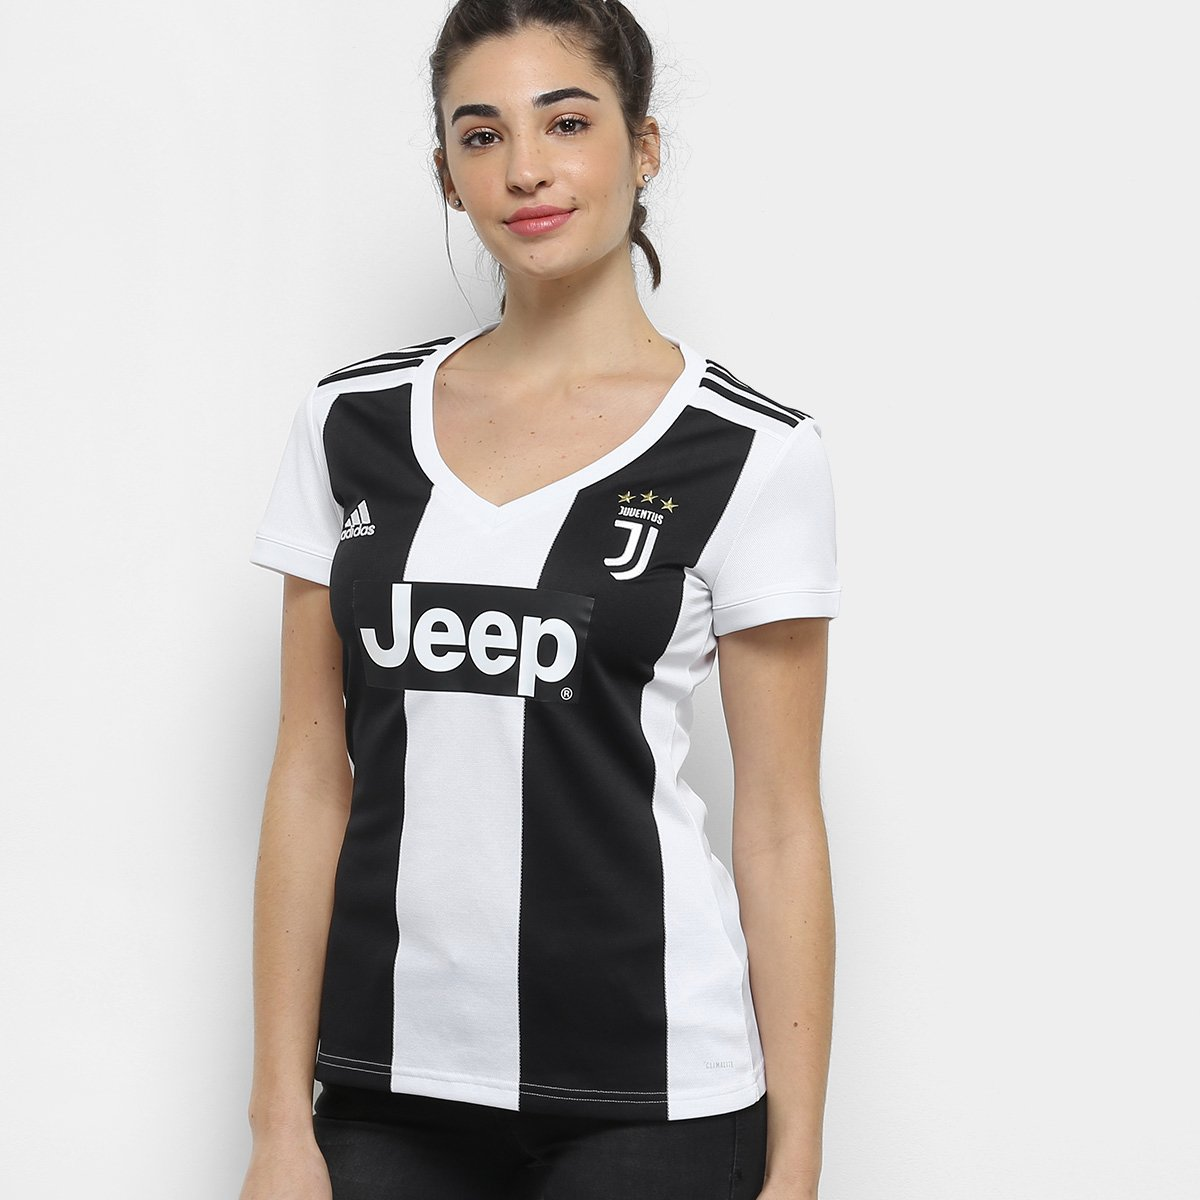 Camisa Juventus Home 2018 s n° - Torcedor Adidas Feminina - Preto e ... bbe0a2549f834